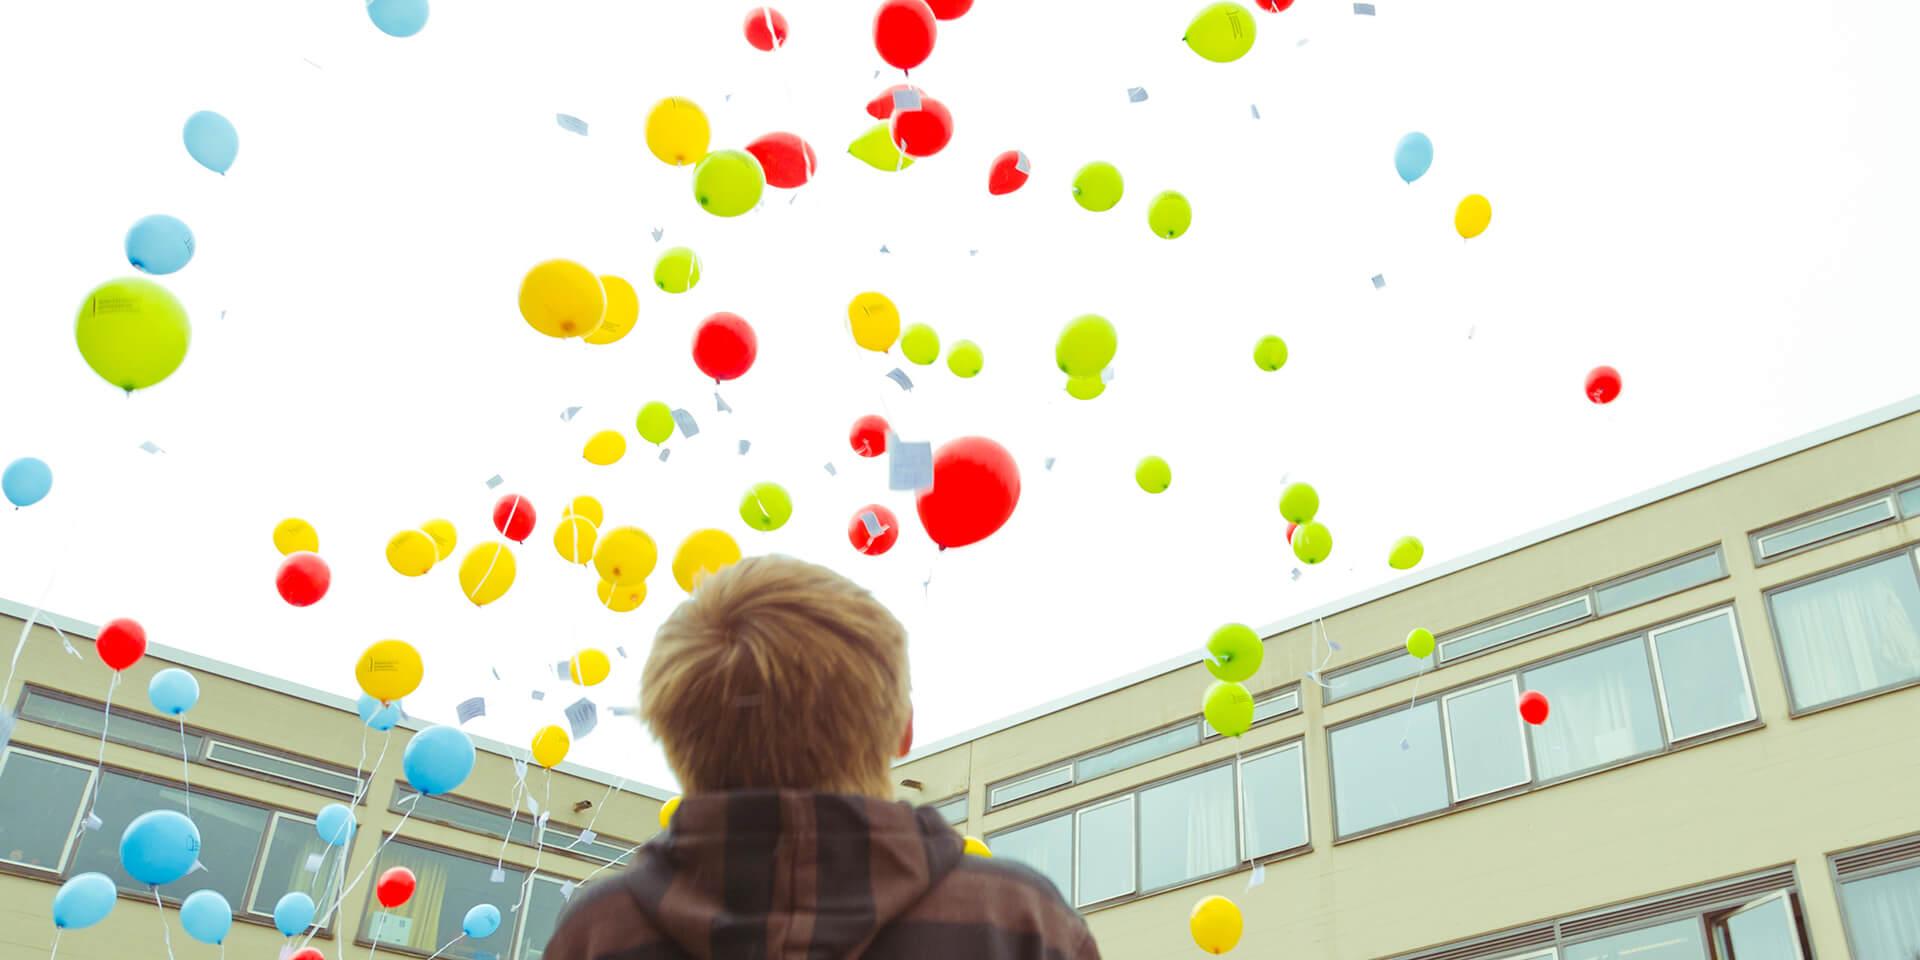 Ein Junge blickt in den Himmel voller Luftballons